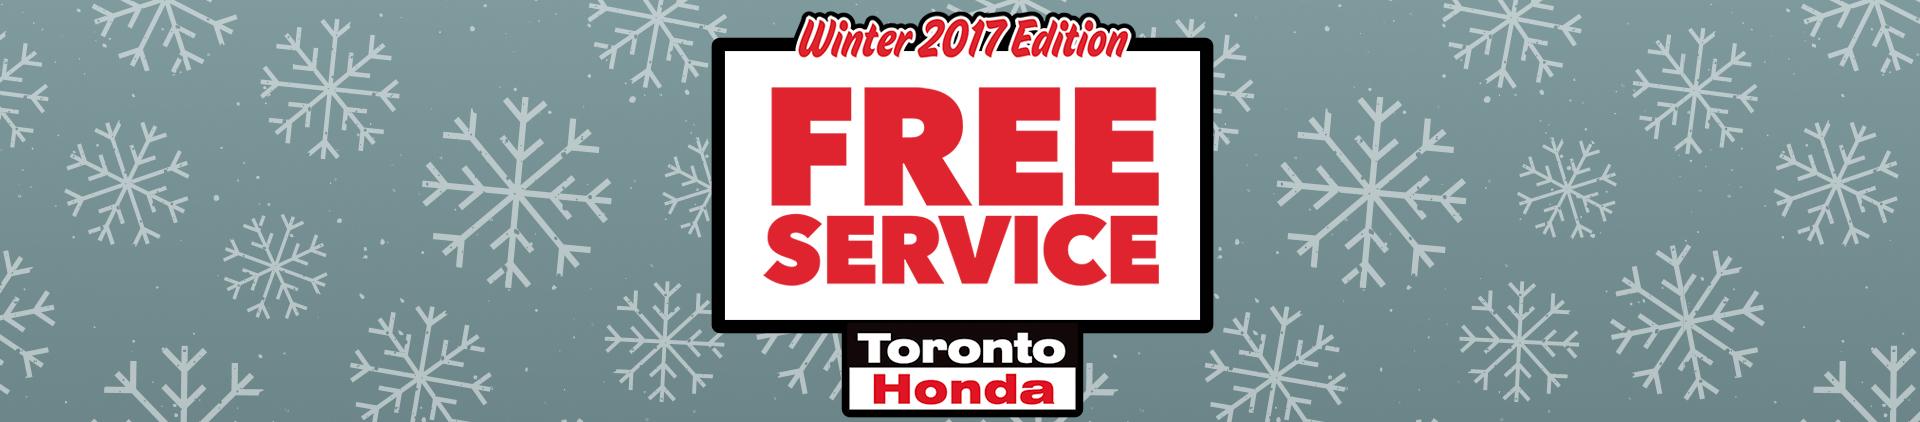 2017 Winter Free Service